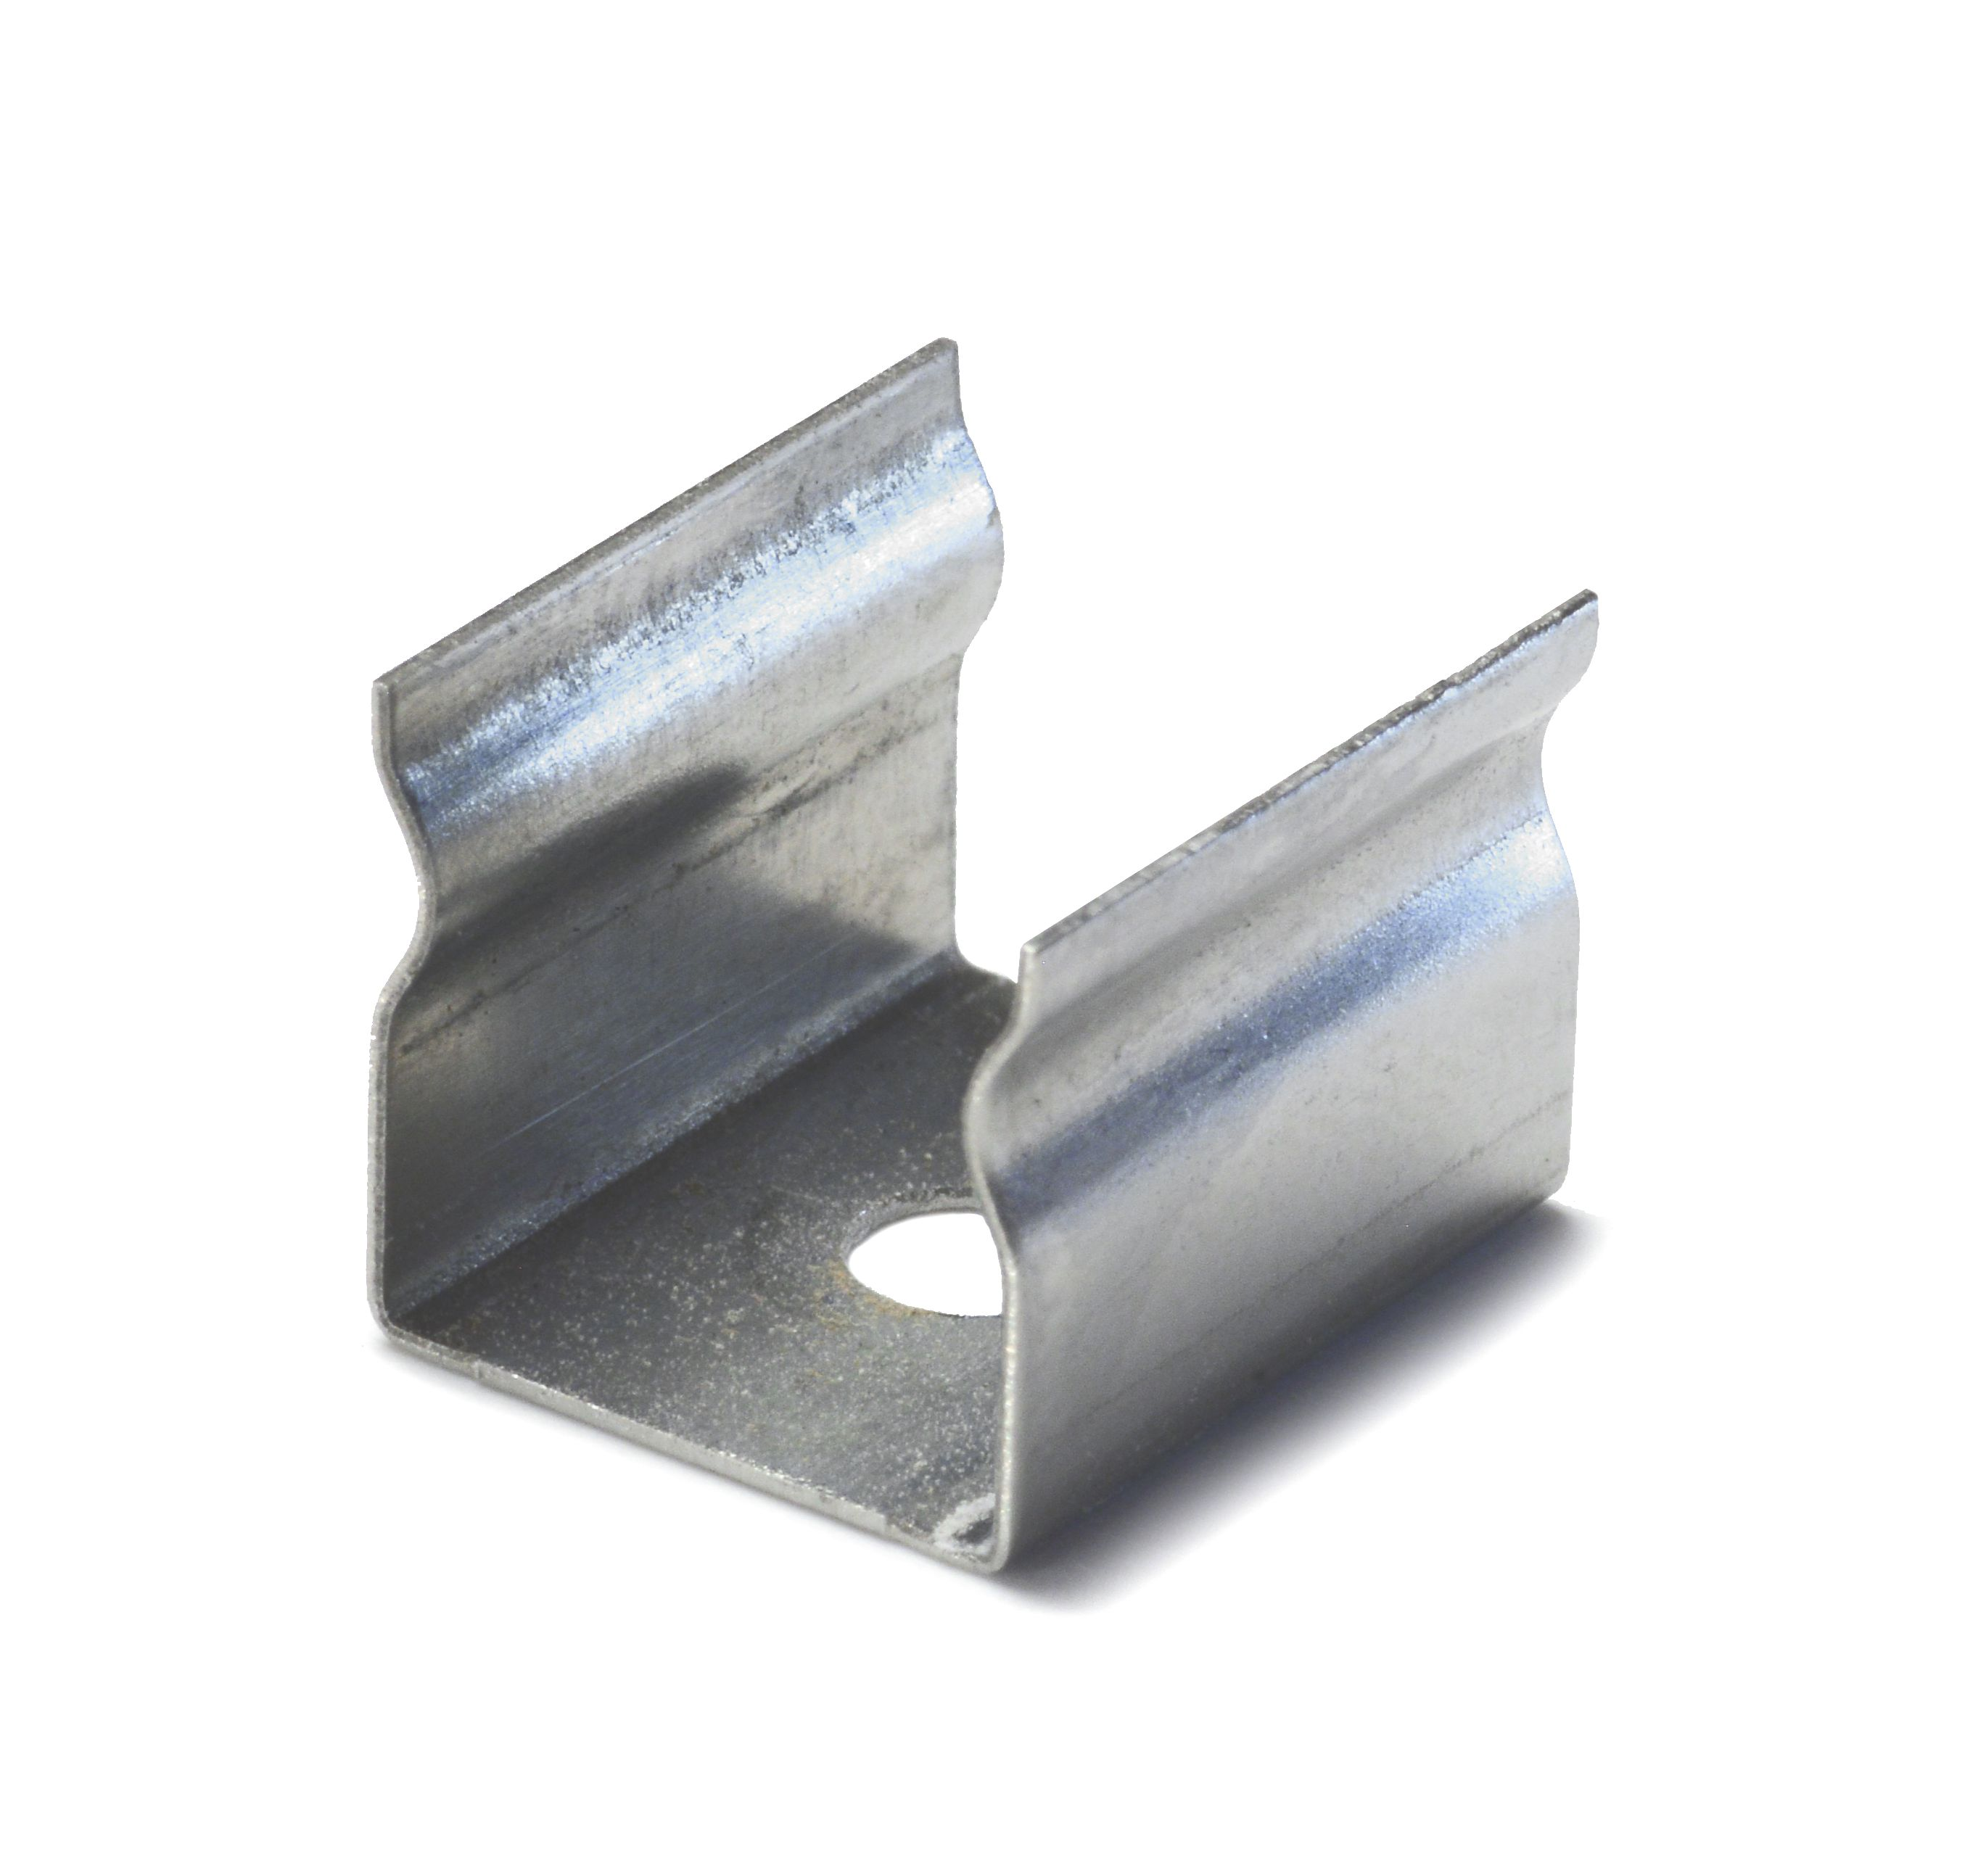 QolorFLEX NuNeon Aluminum Extrusion Mounting Clip, Pack of 10